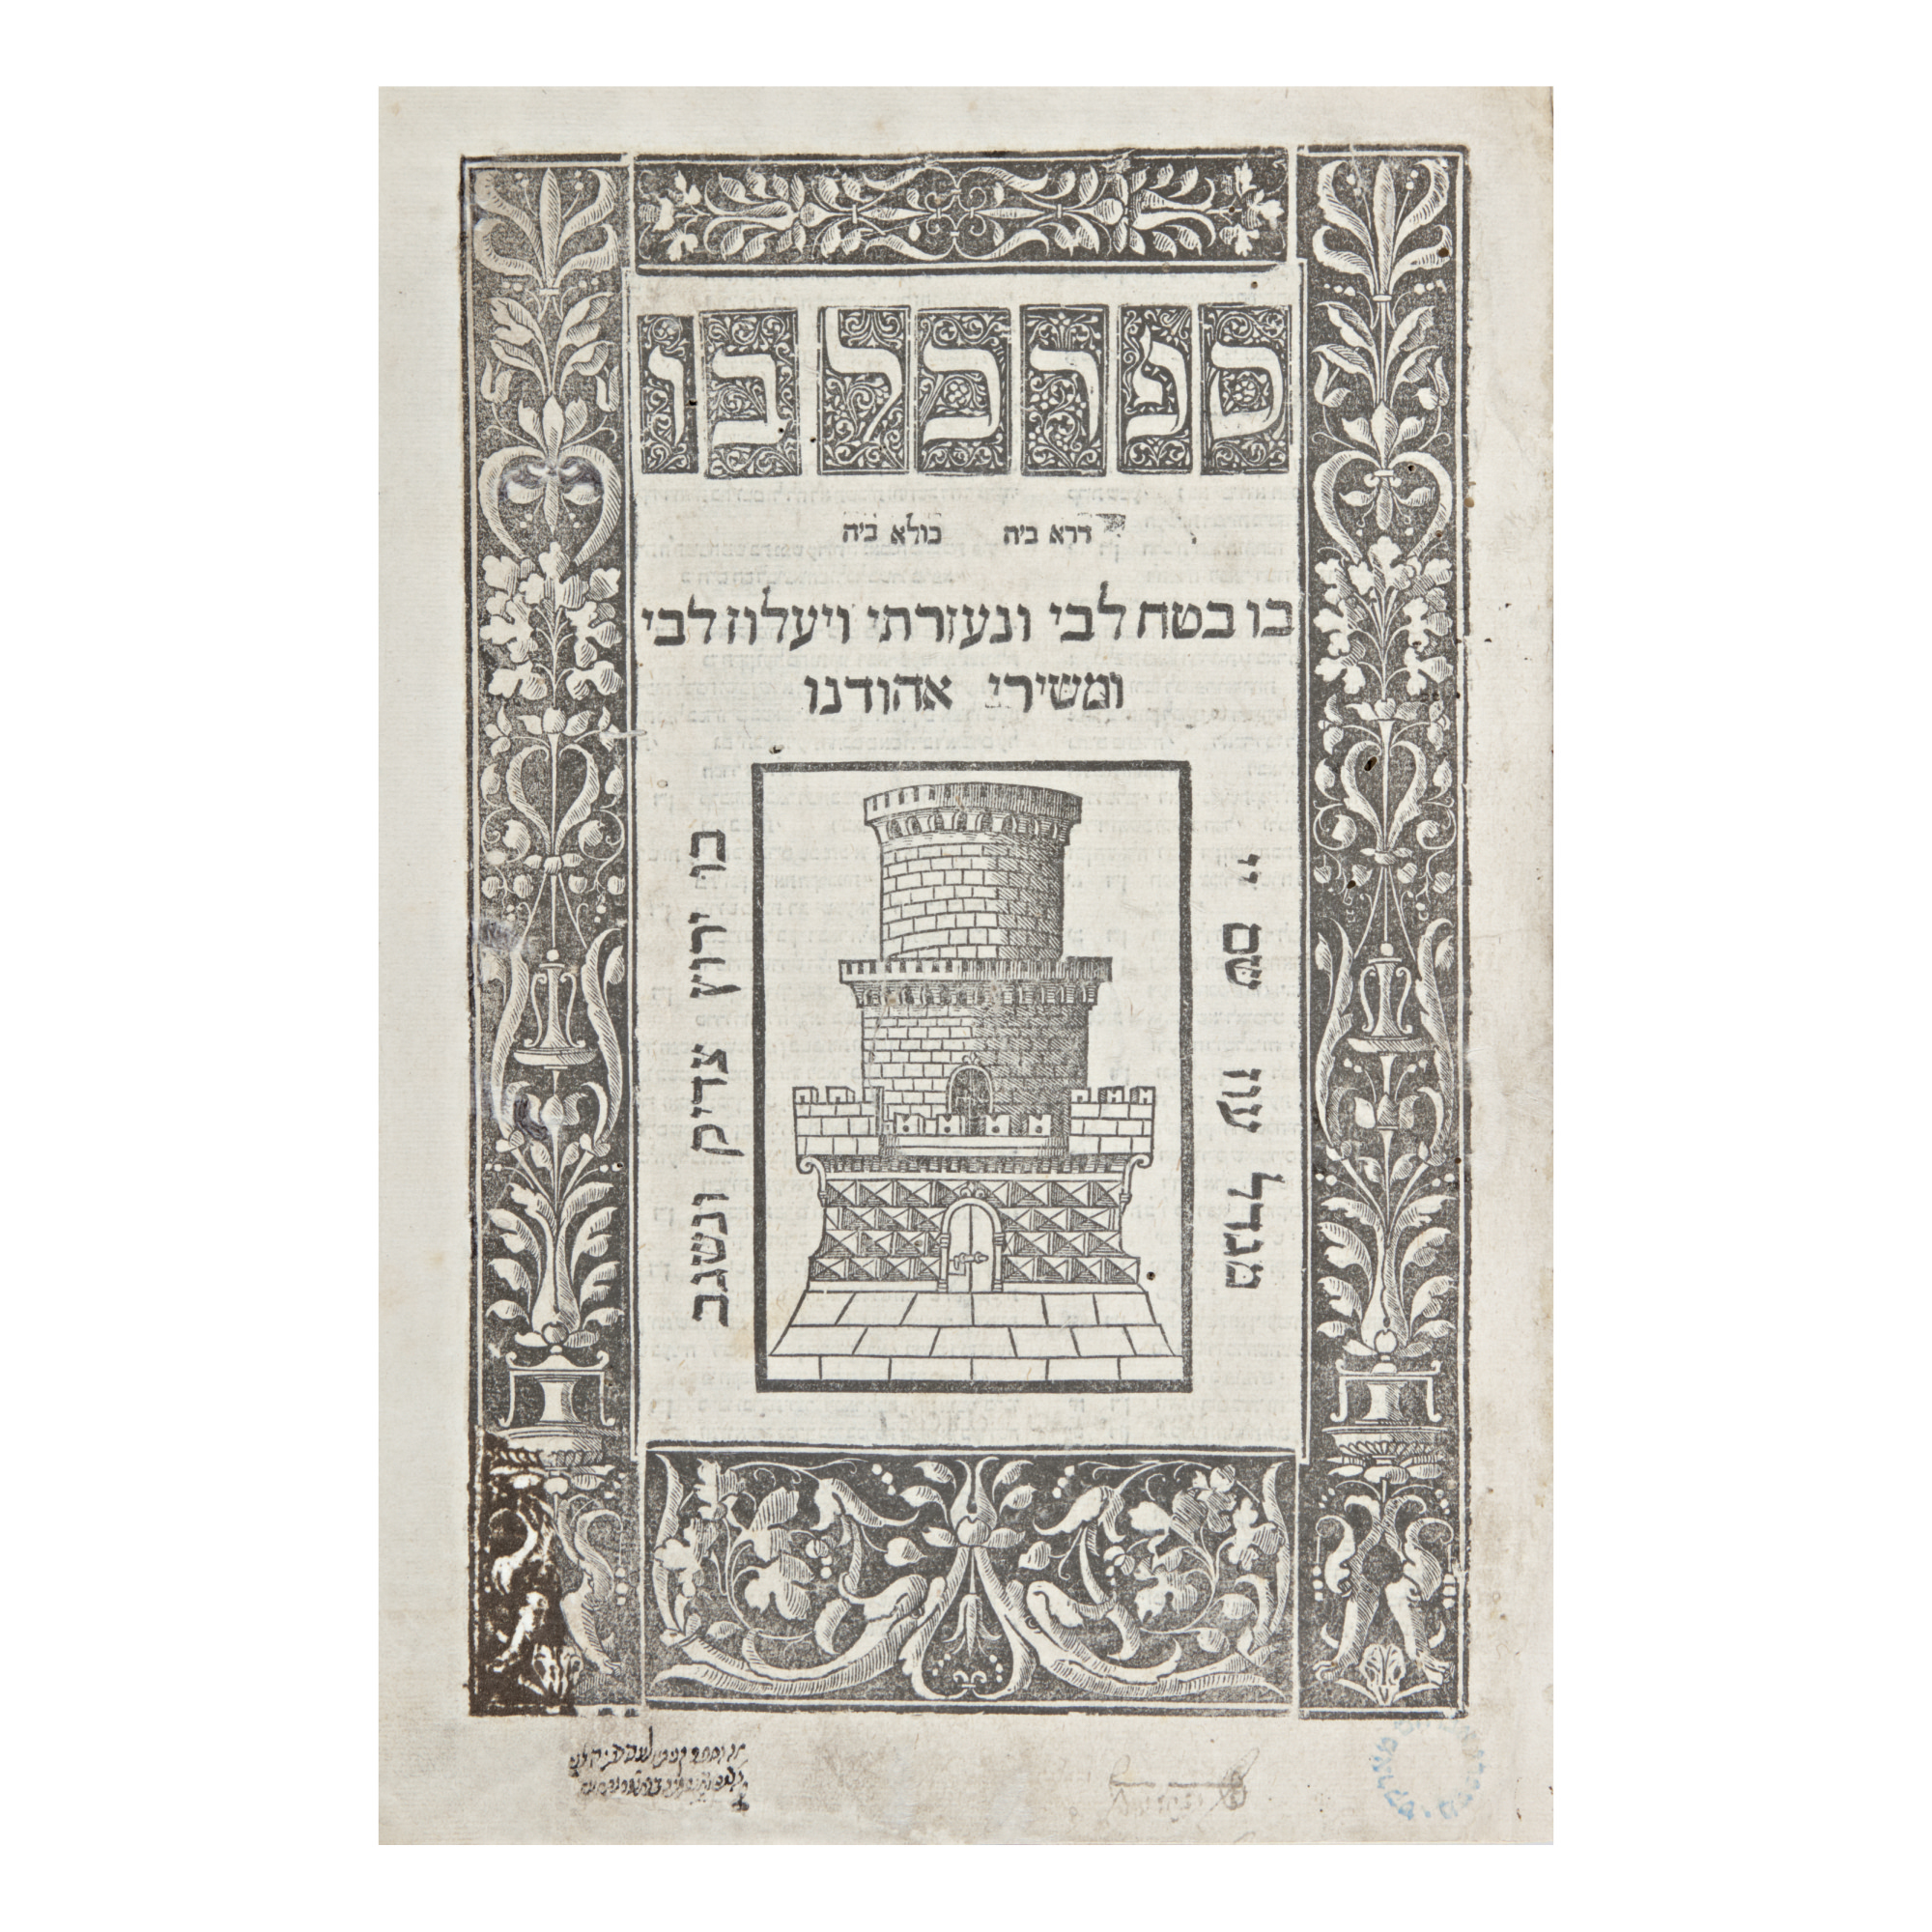 SEFER KOL BO (HALAKHIC COMPENDIUM), RIMINI: GERSHOM SONCINO, [CA. 1520]